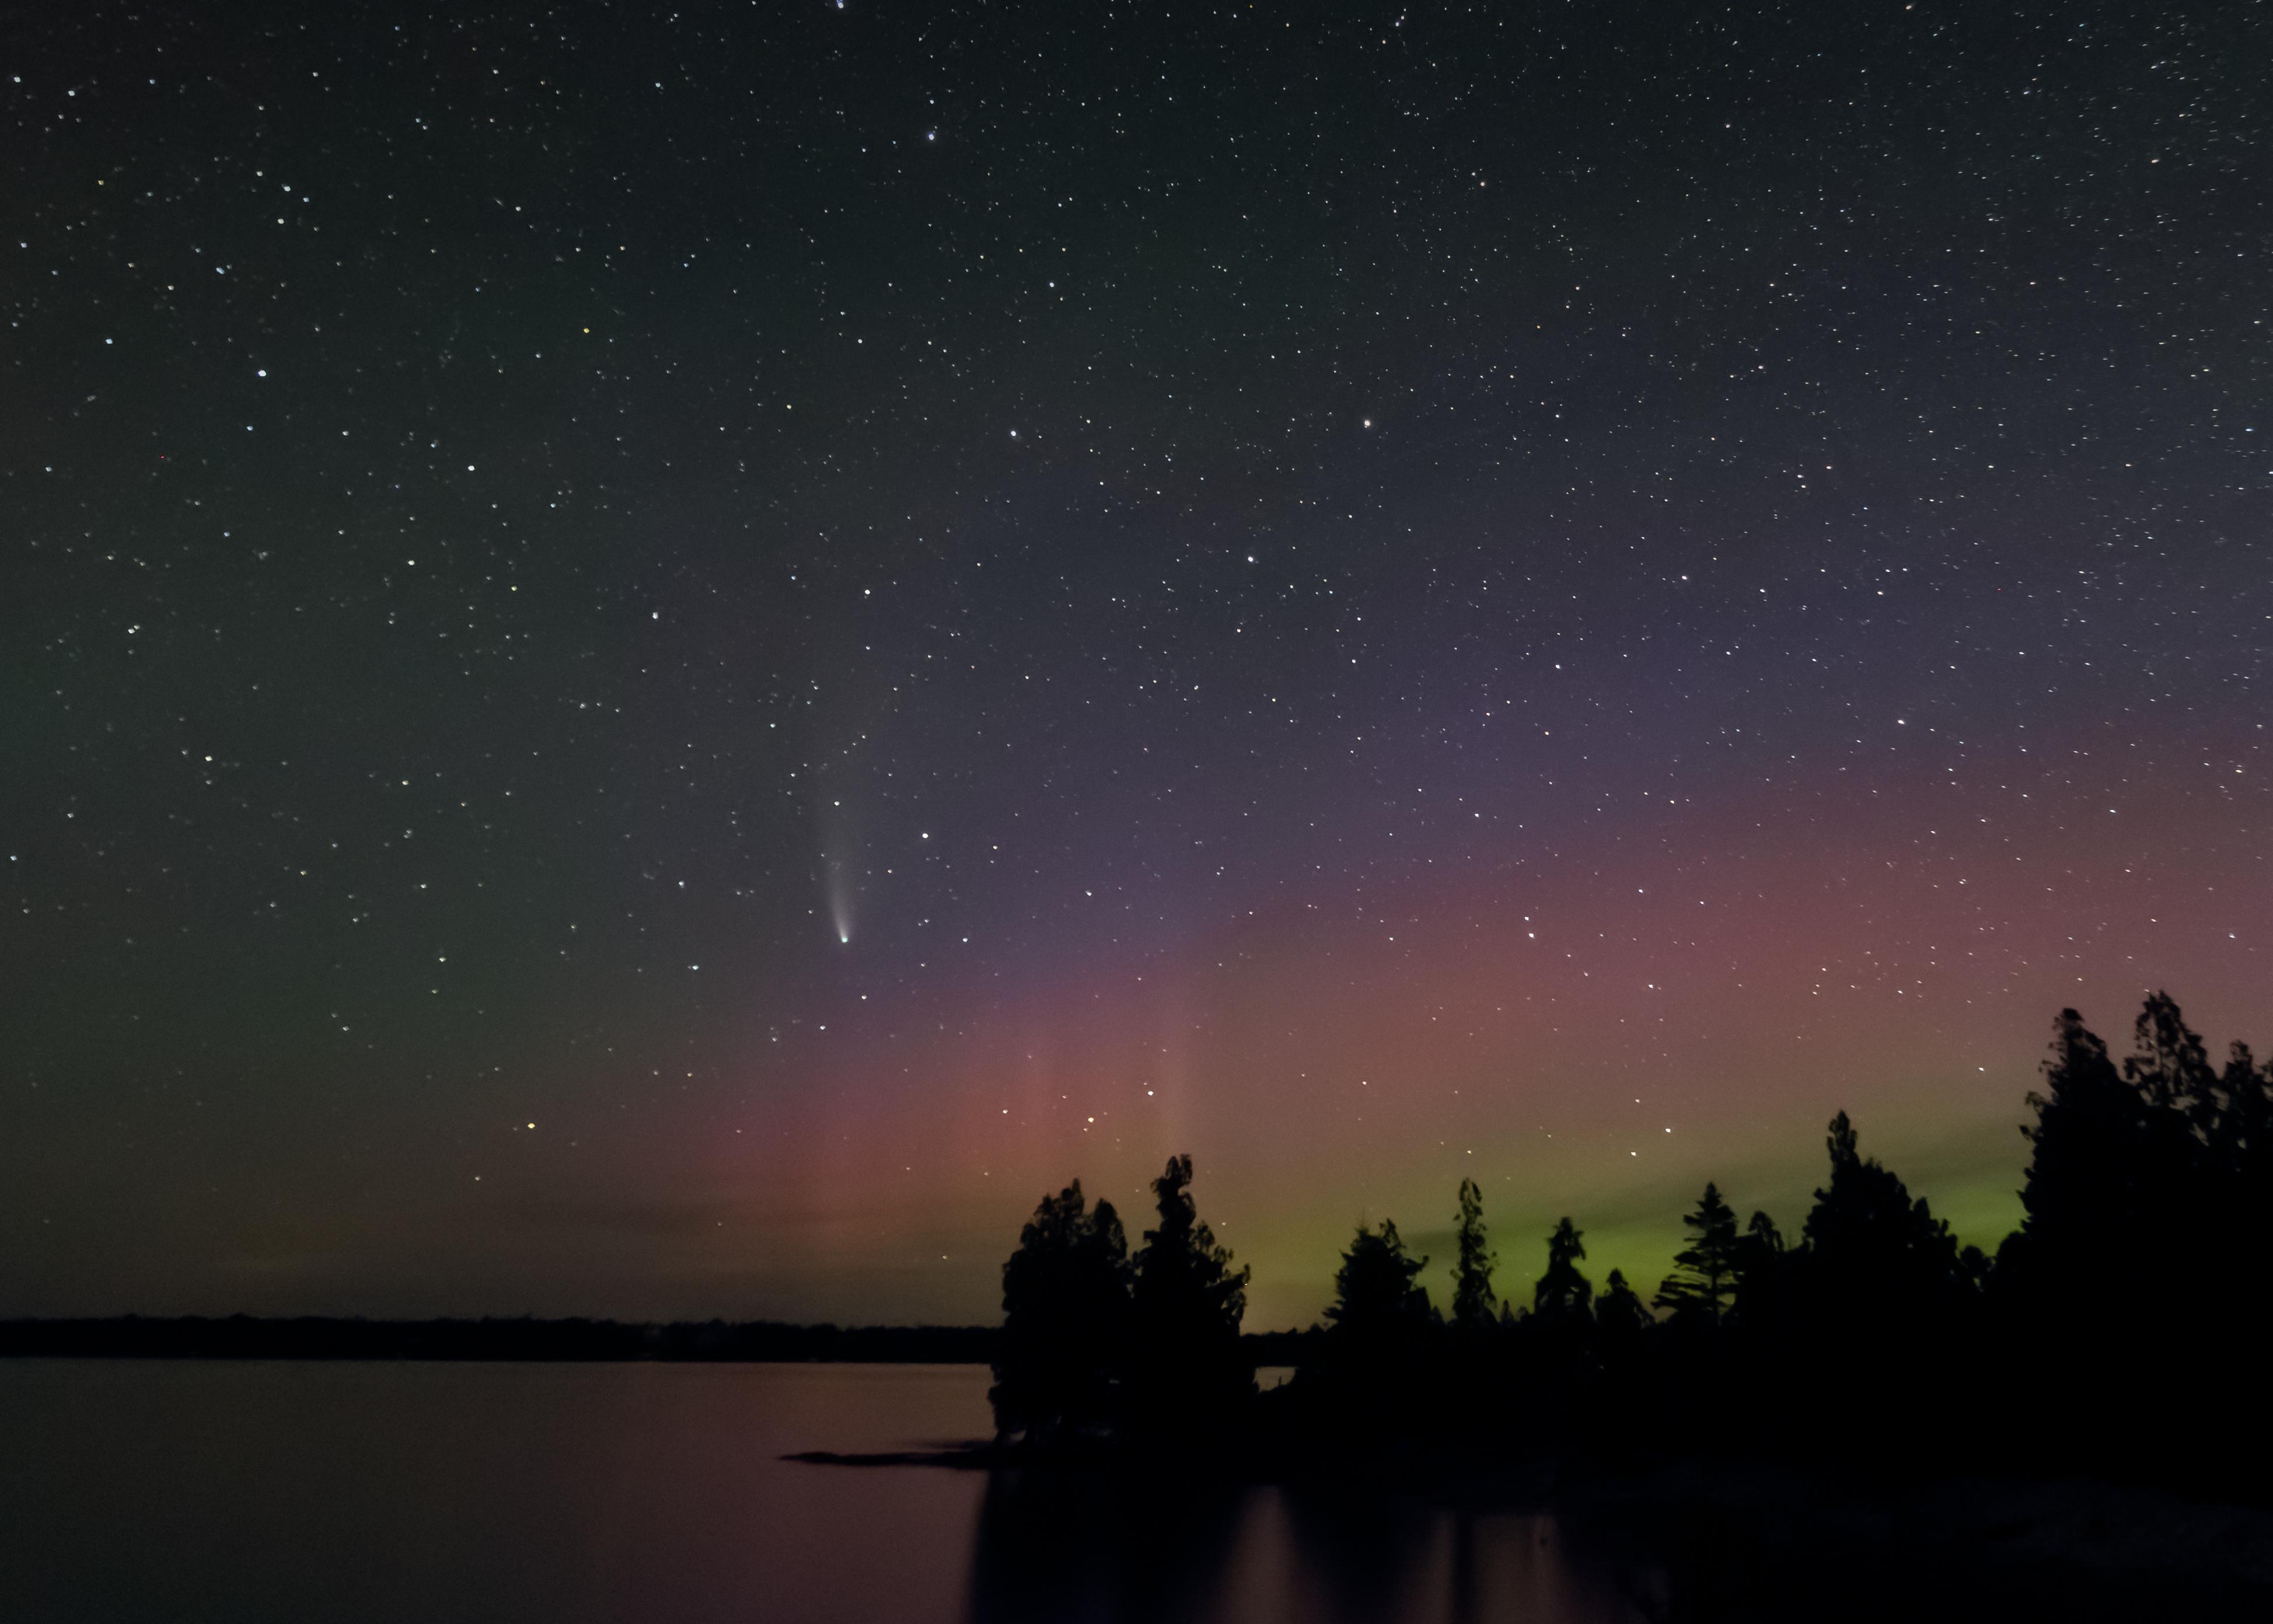 NEOWIZE Comet and Aurora borealis